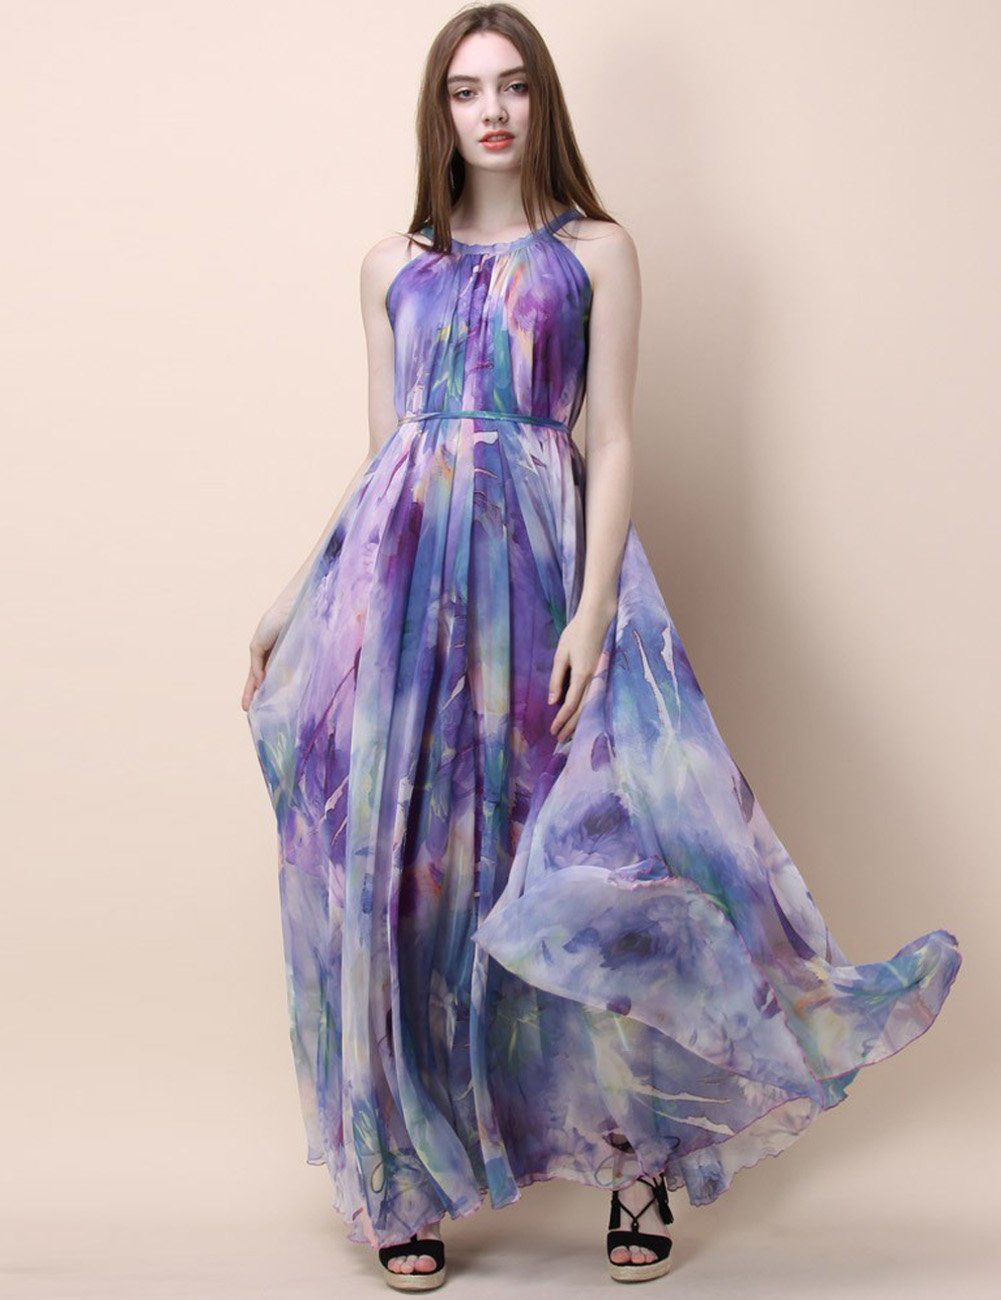 2fb9b98ff6e Medeshe Womens Chiffon Floral Holiday Beach Bridesmaid Maxi Dress Sundress  Medium Petite Lavender Lotus   Read